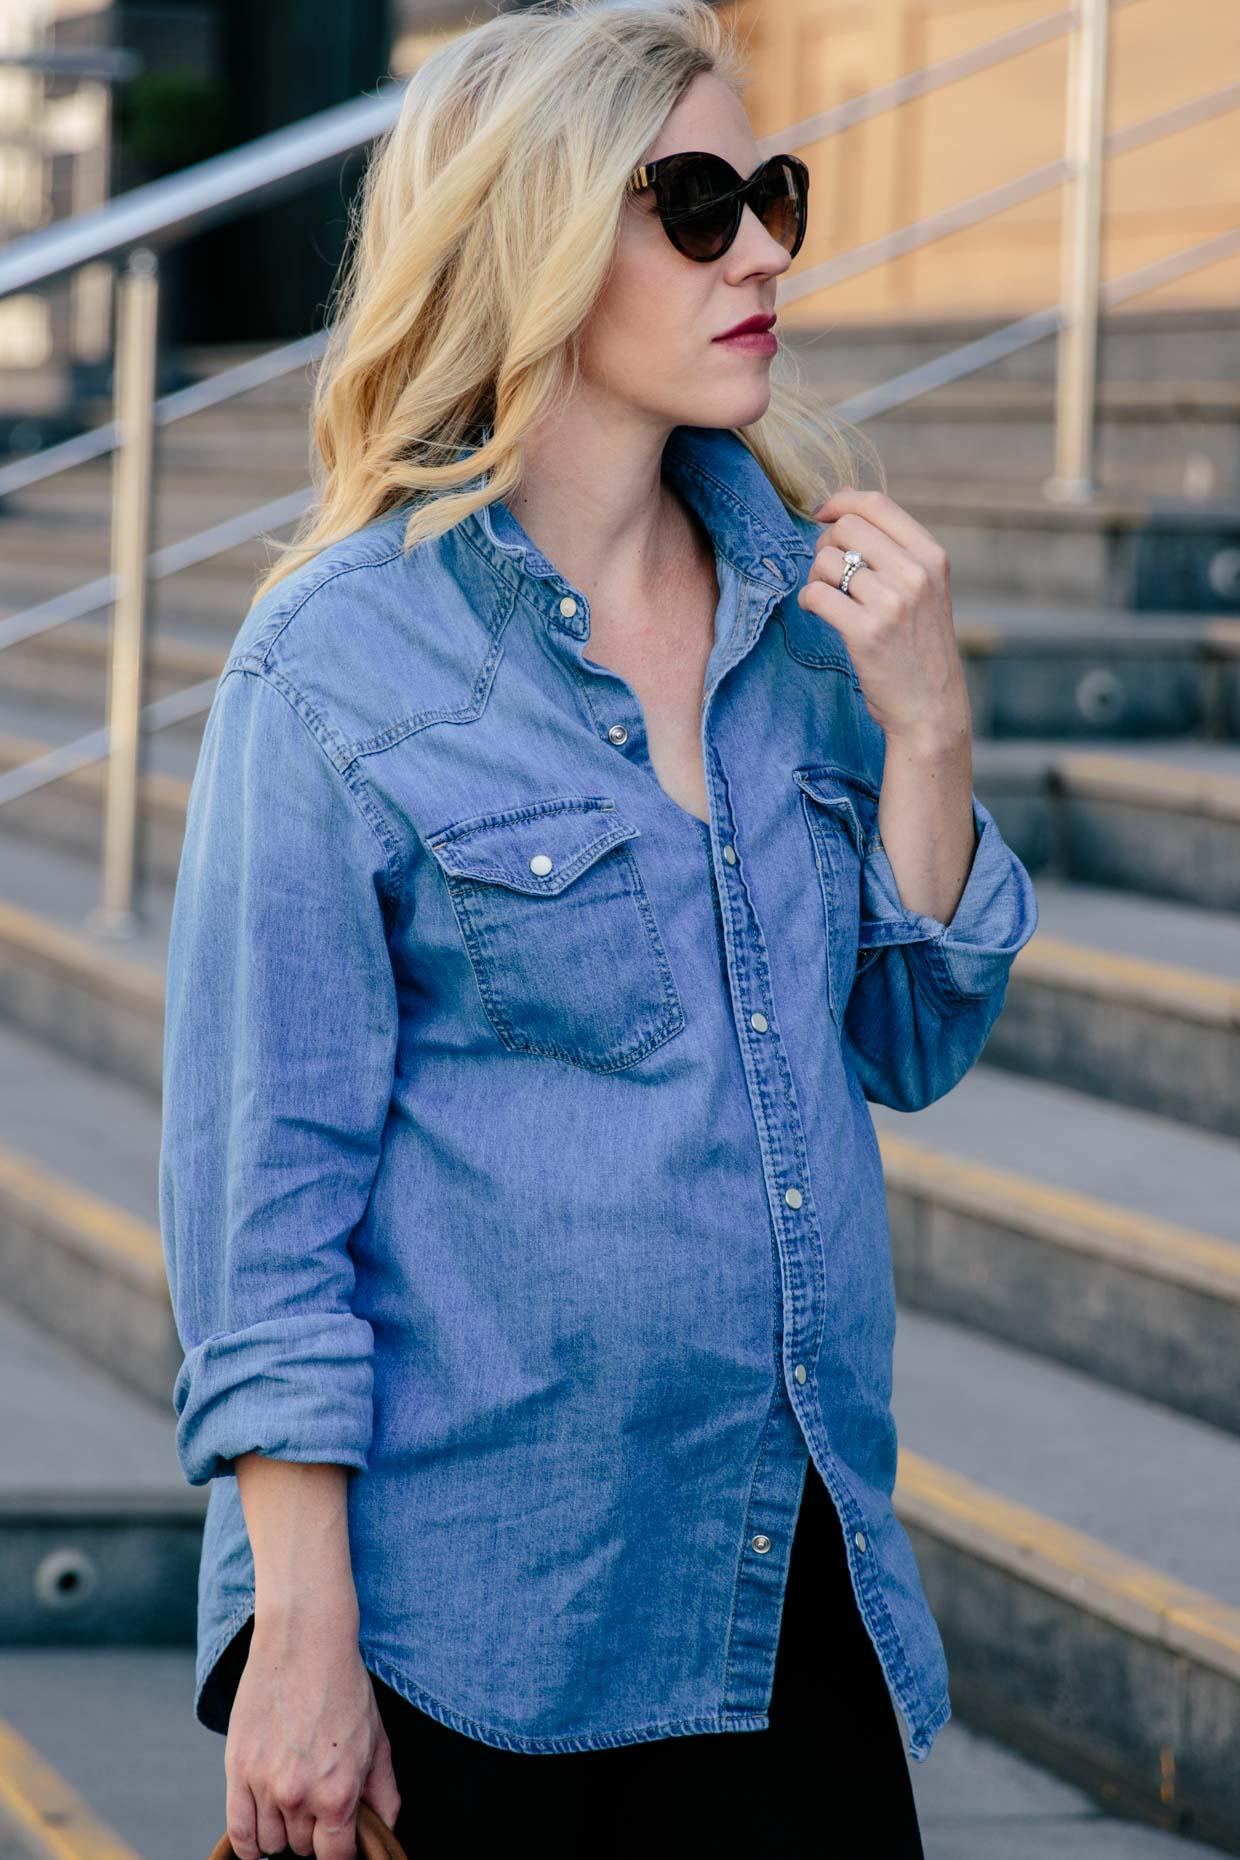 ca52b3a6932b Meagan Brandon fashion blogger shows how to wear an oversized denim shirt  for pregnancy style